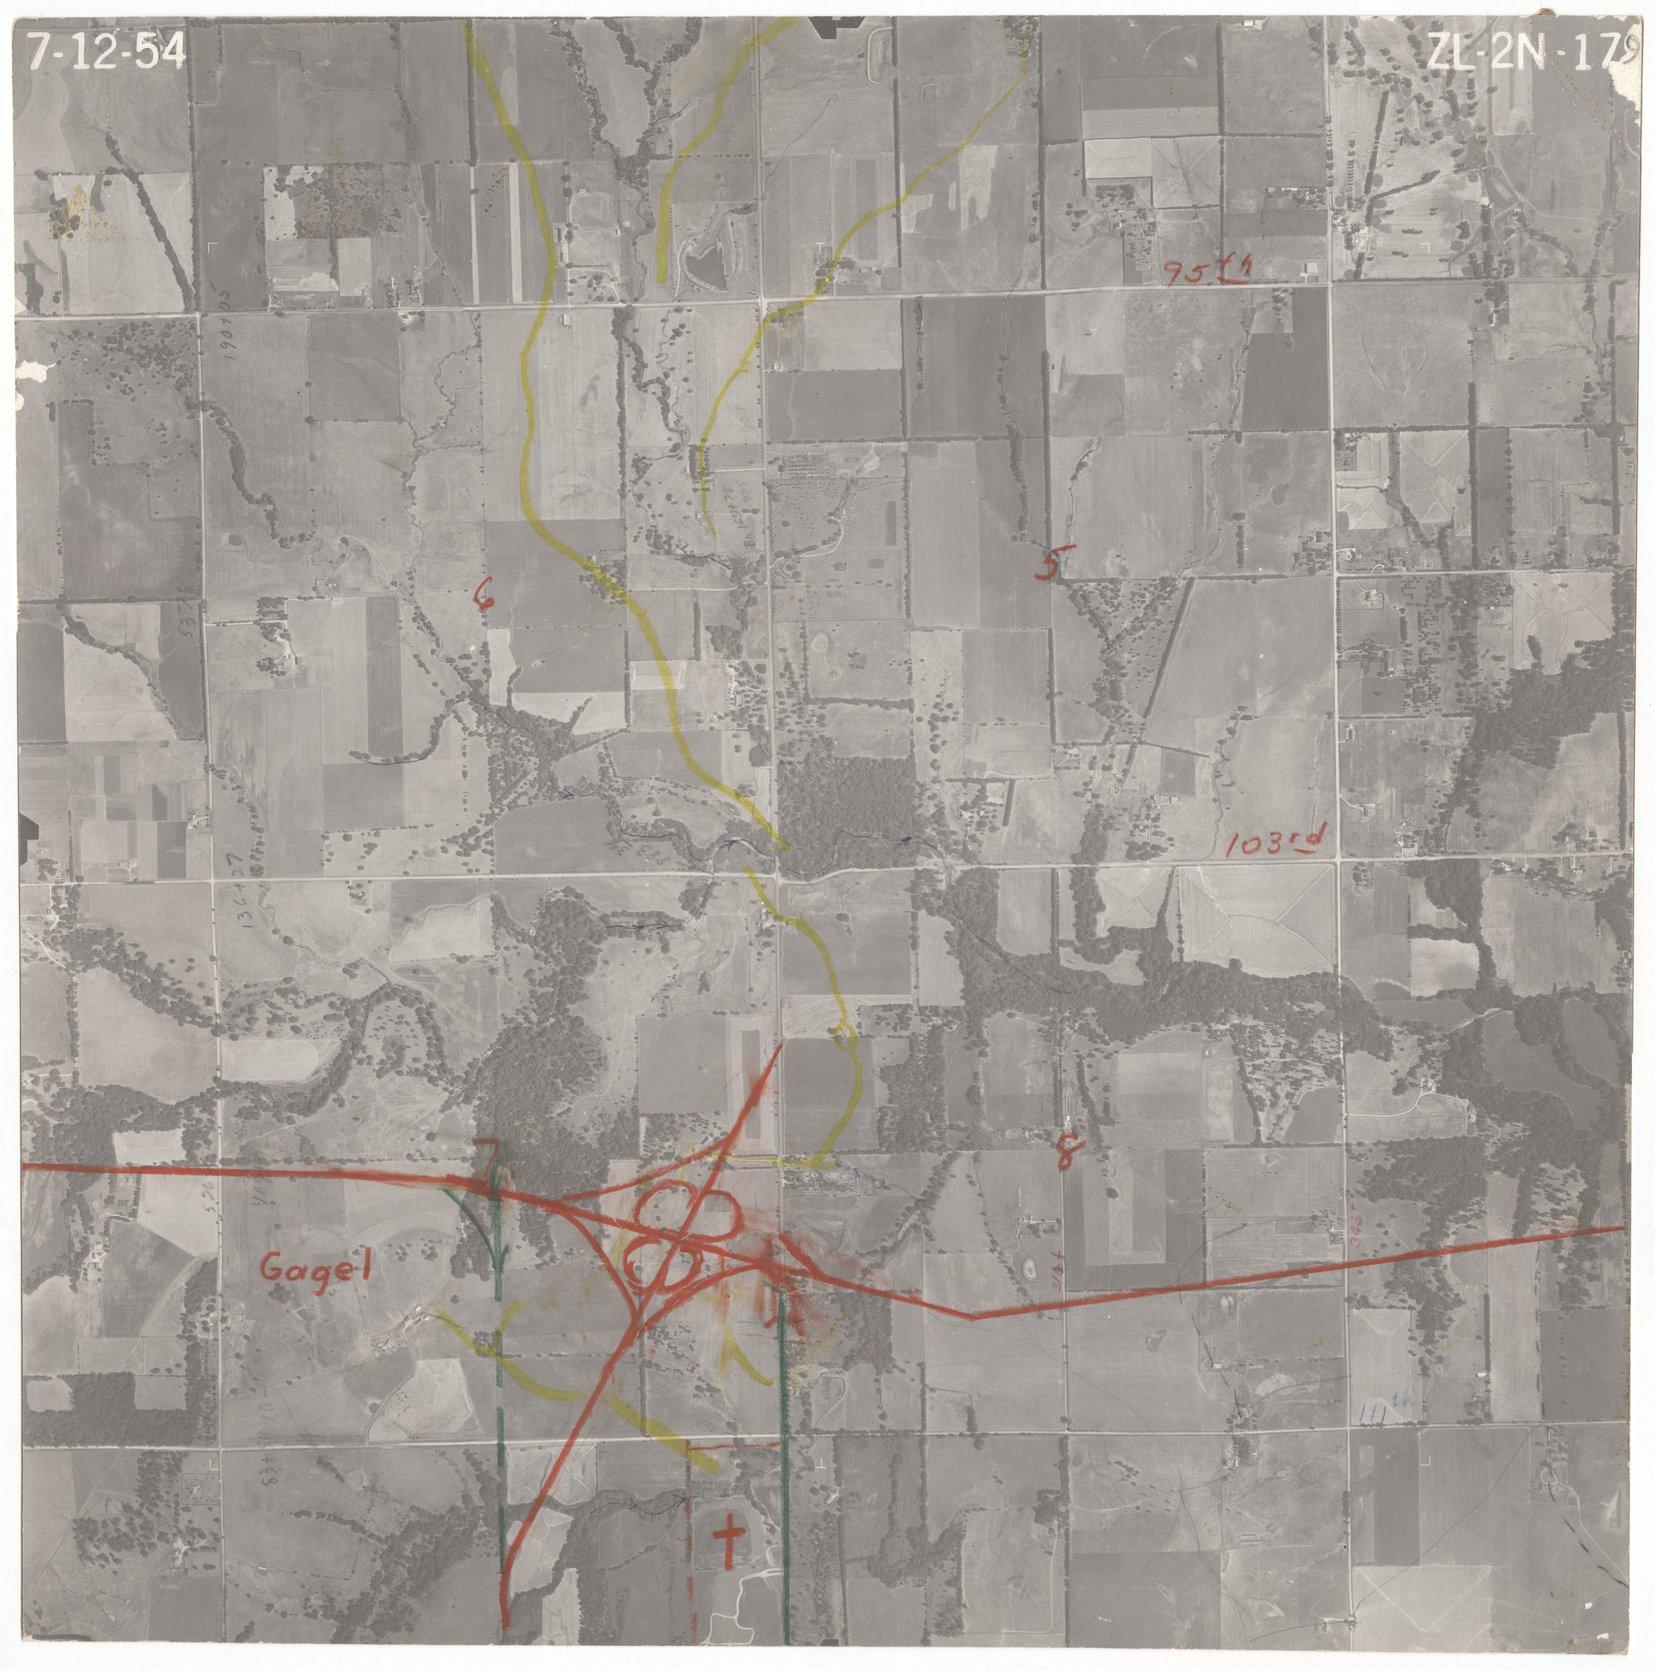 Aerial View of Johnson County, Kansas - 1